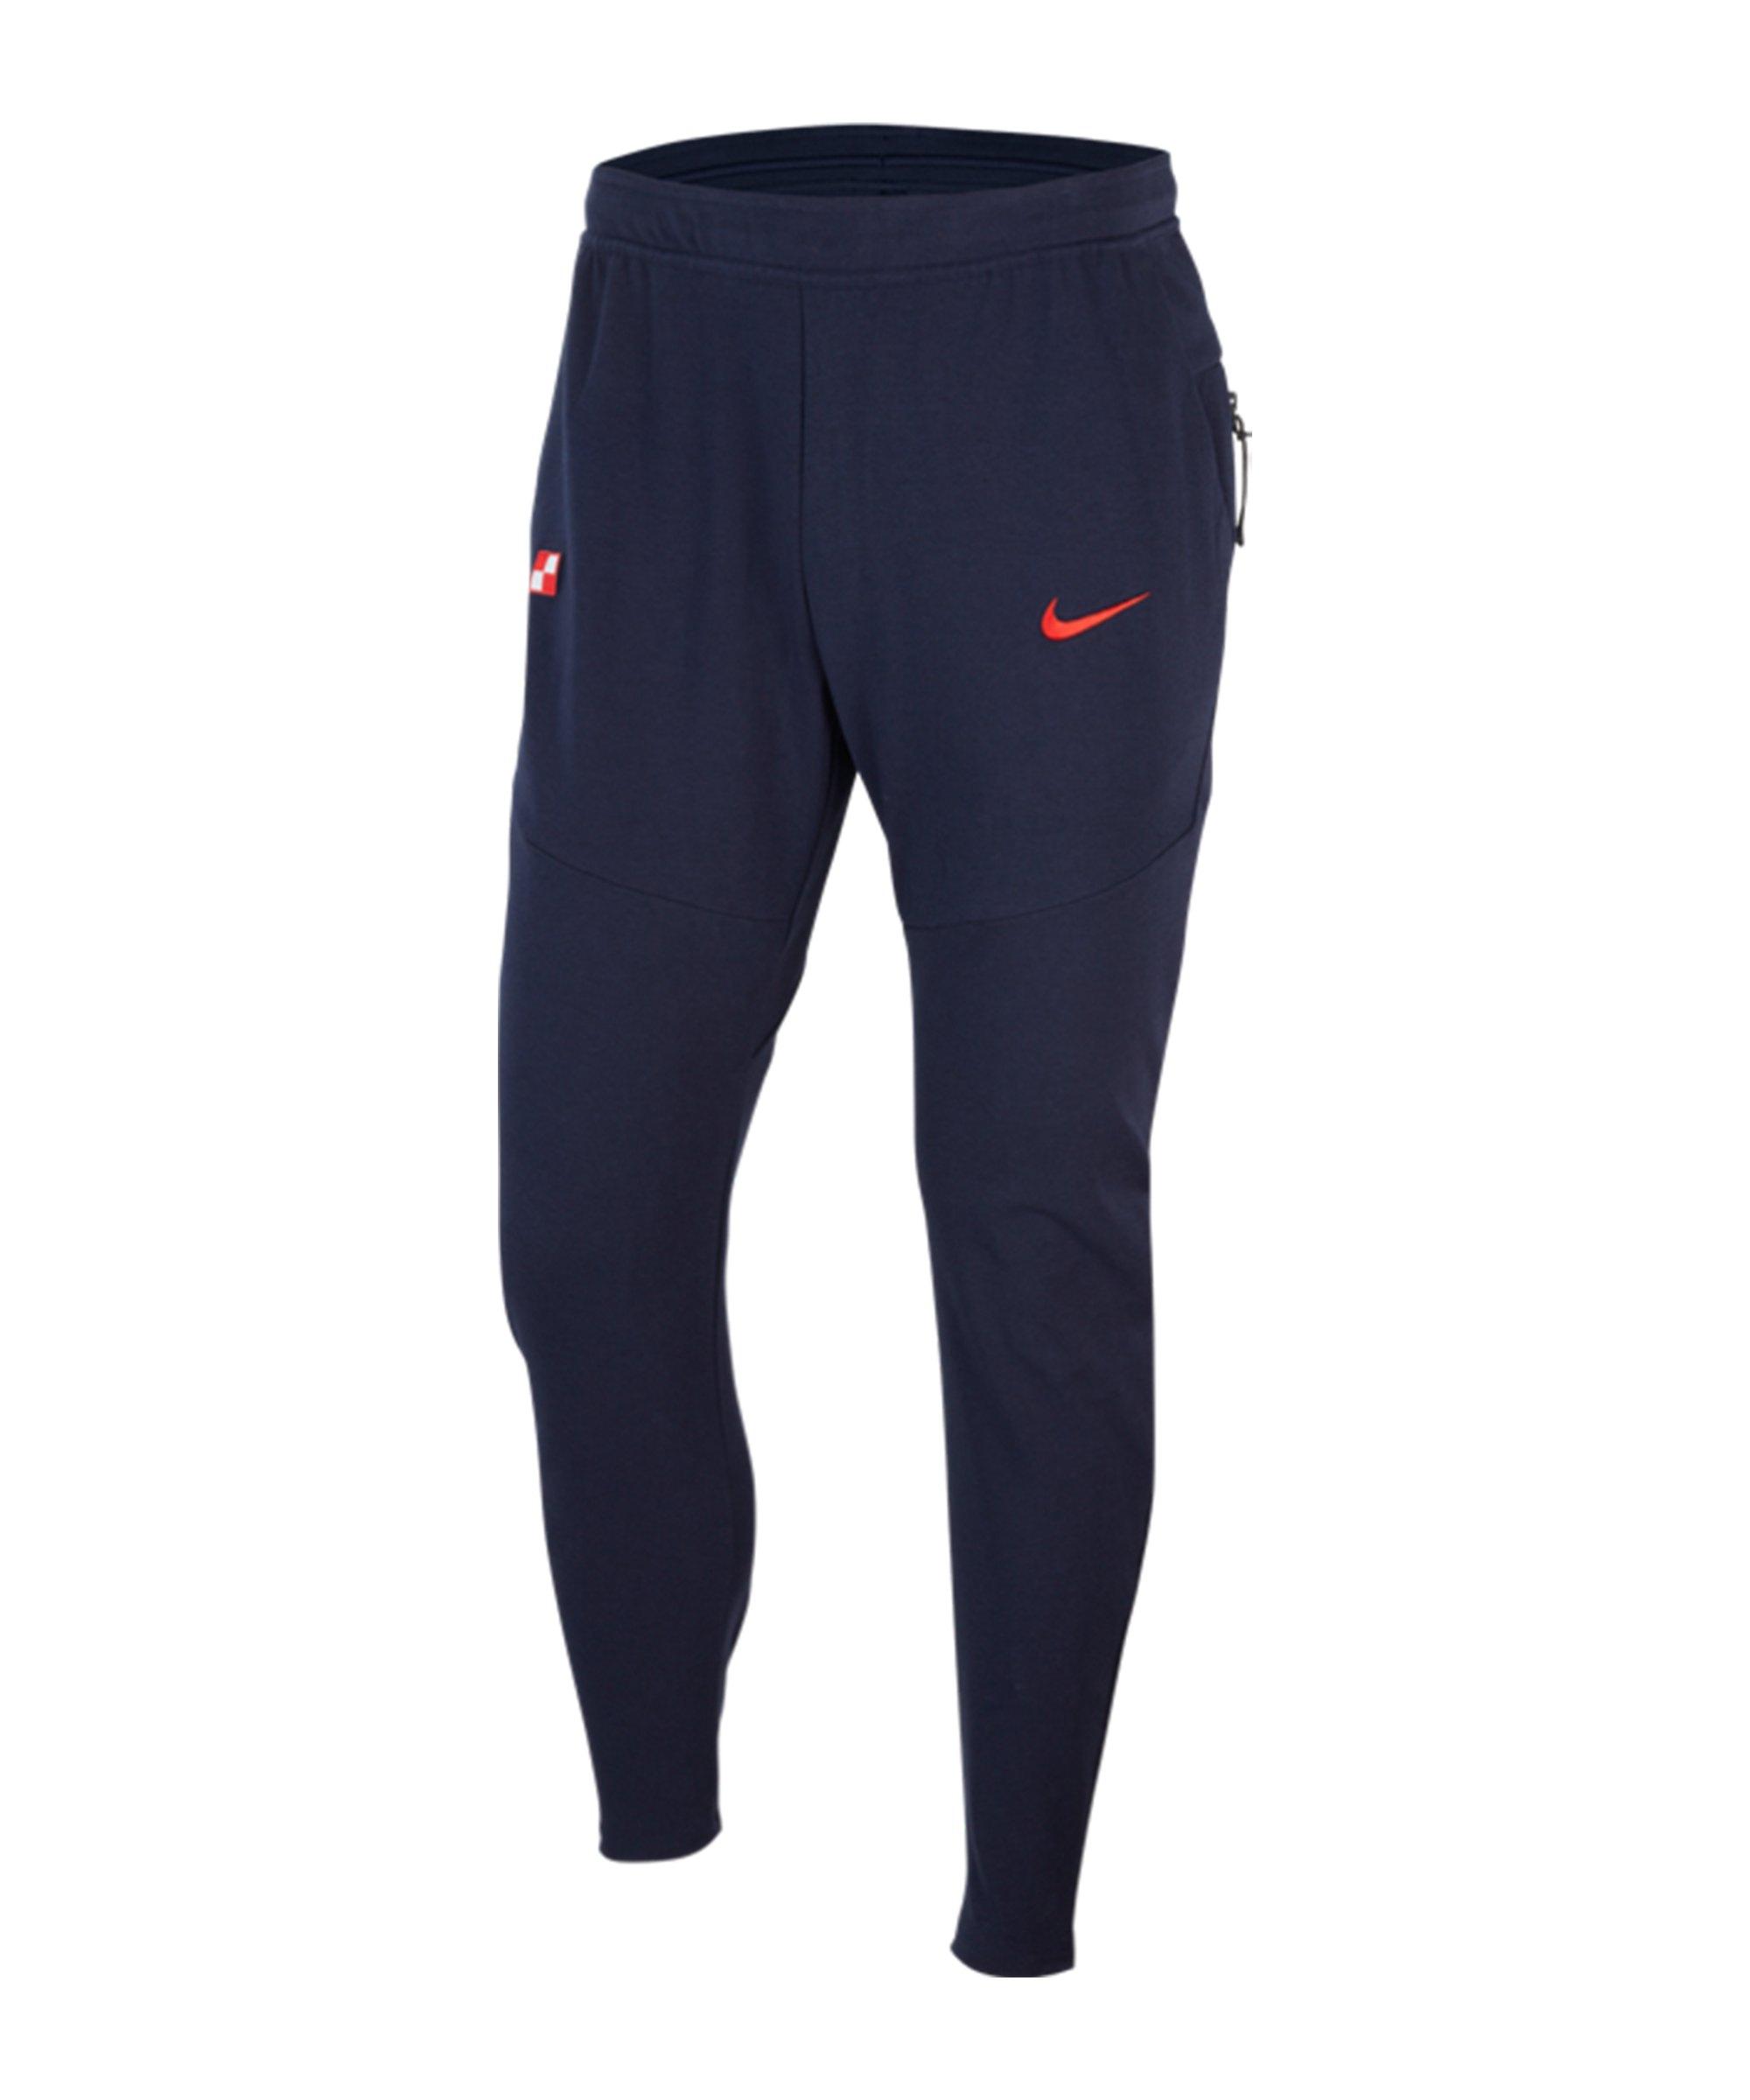 Nike Kroatien Tech Pack Pant Hose Grau F451 - grau